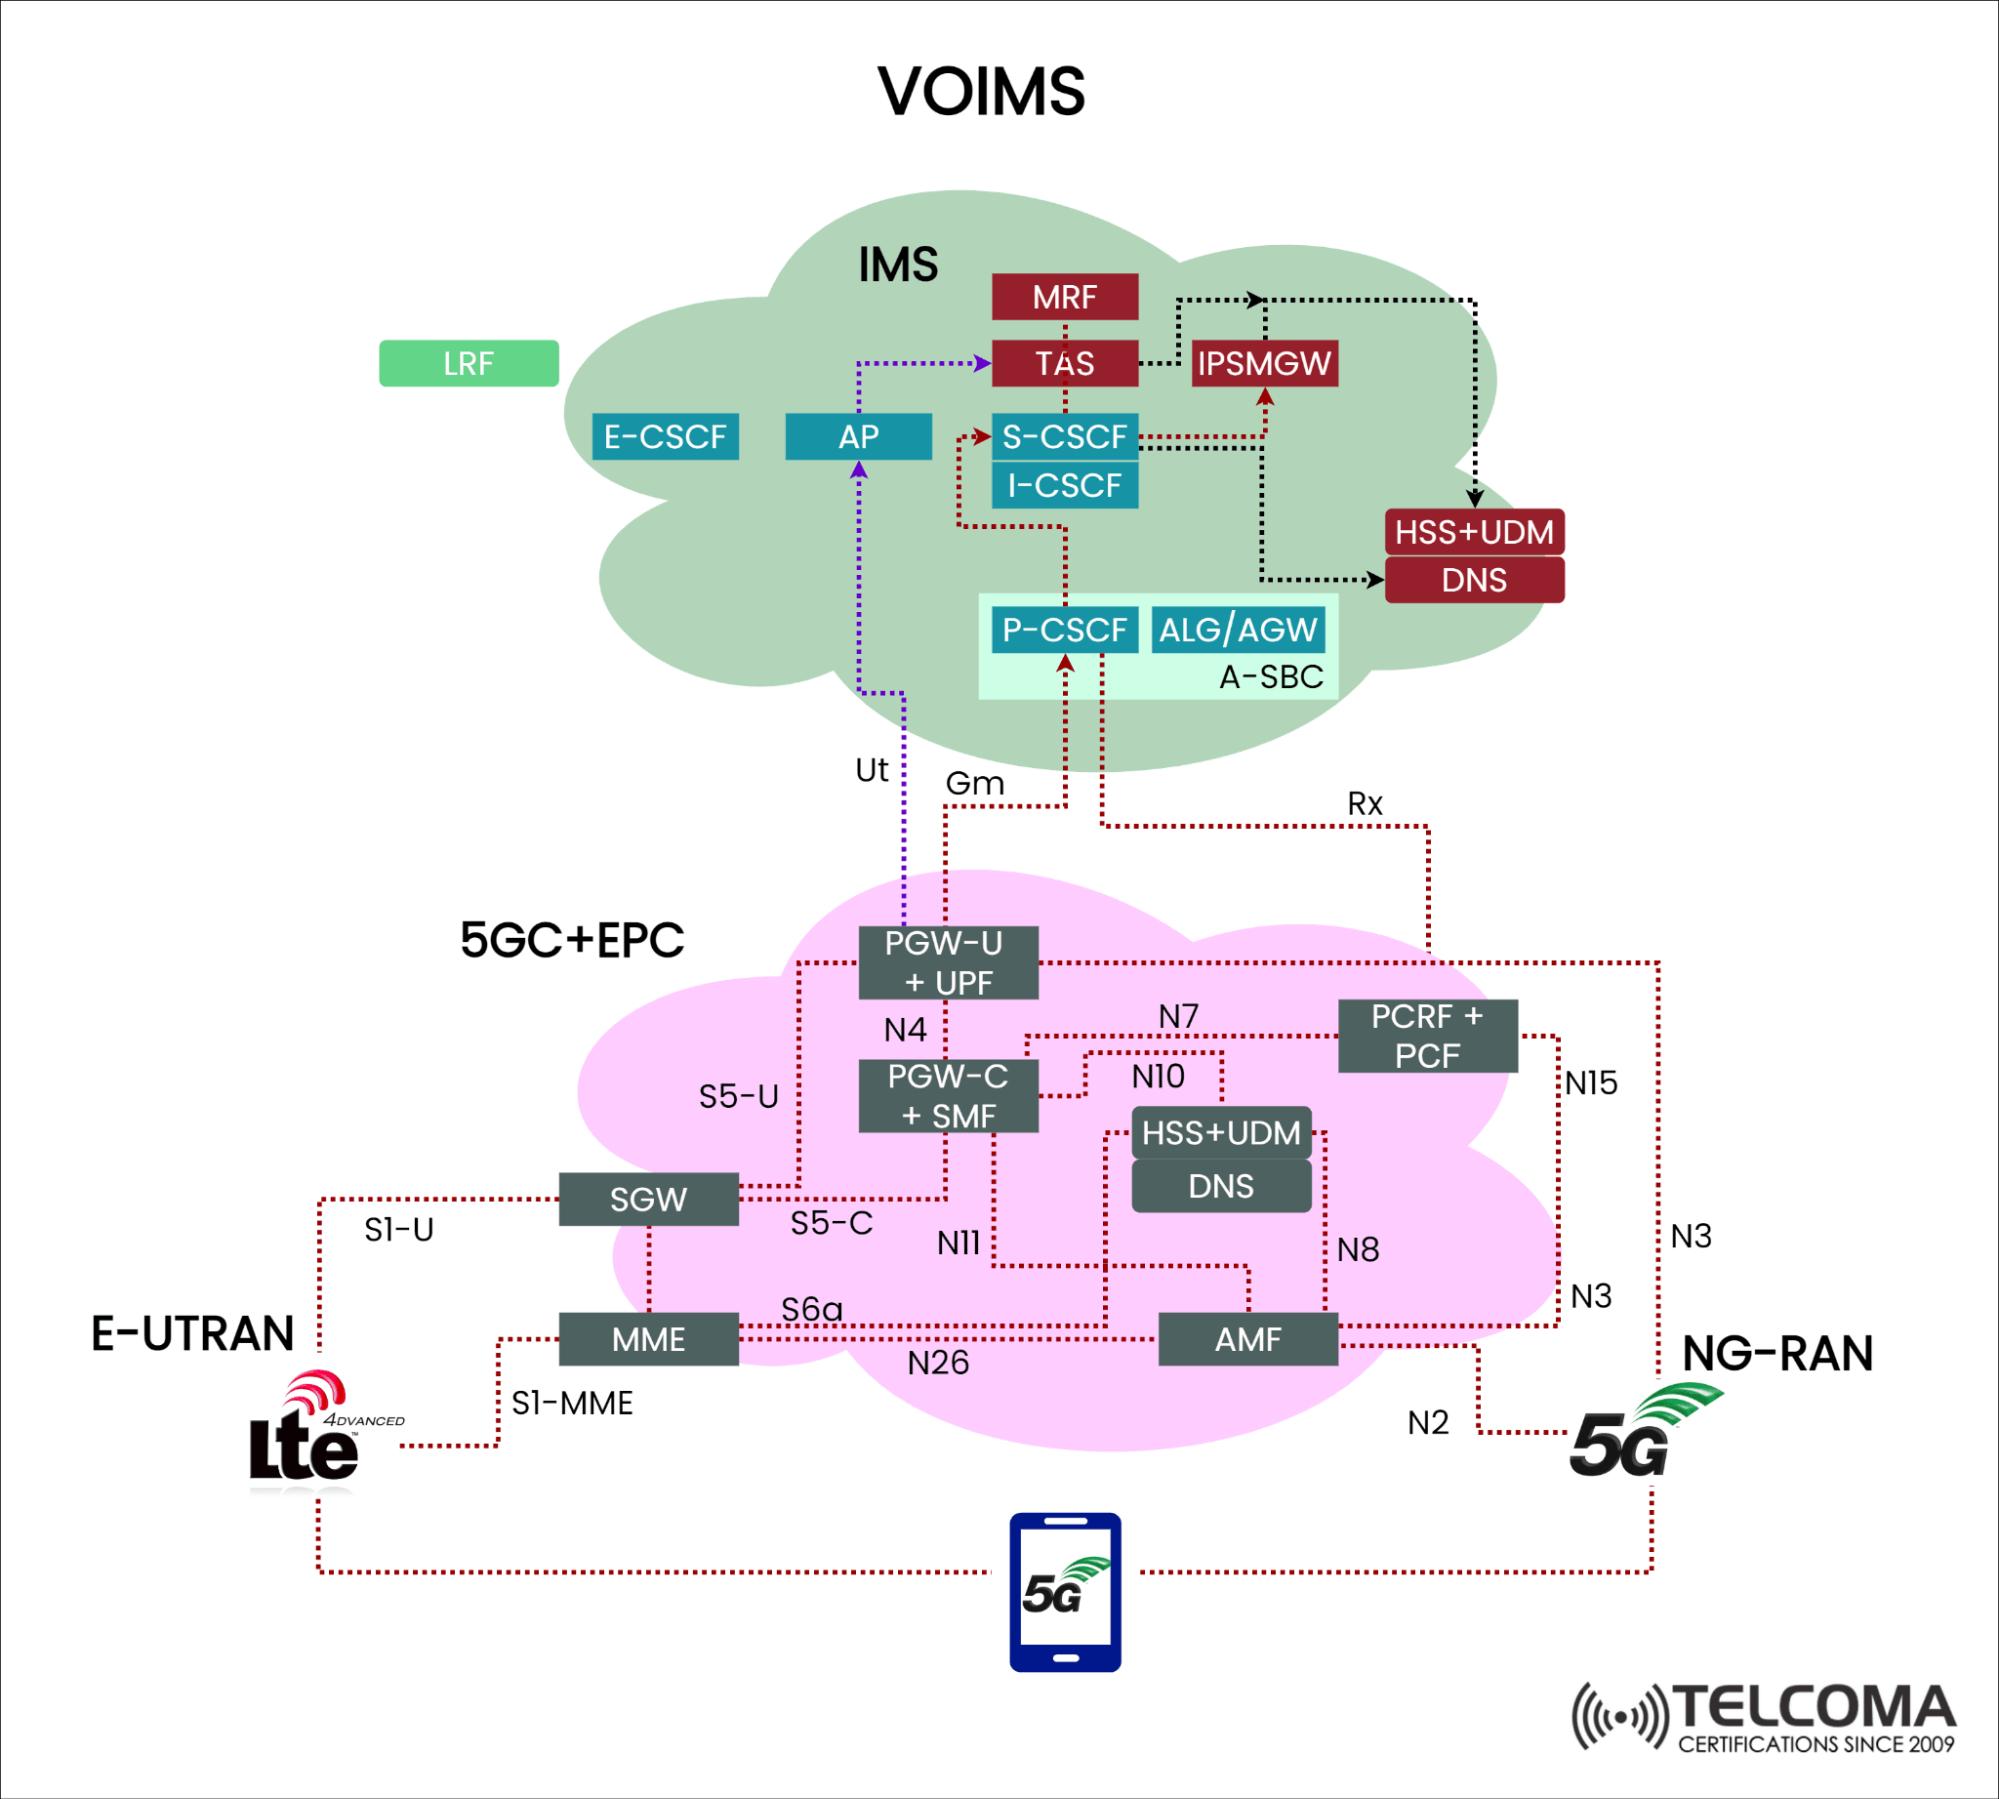 voims